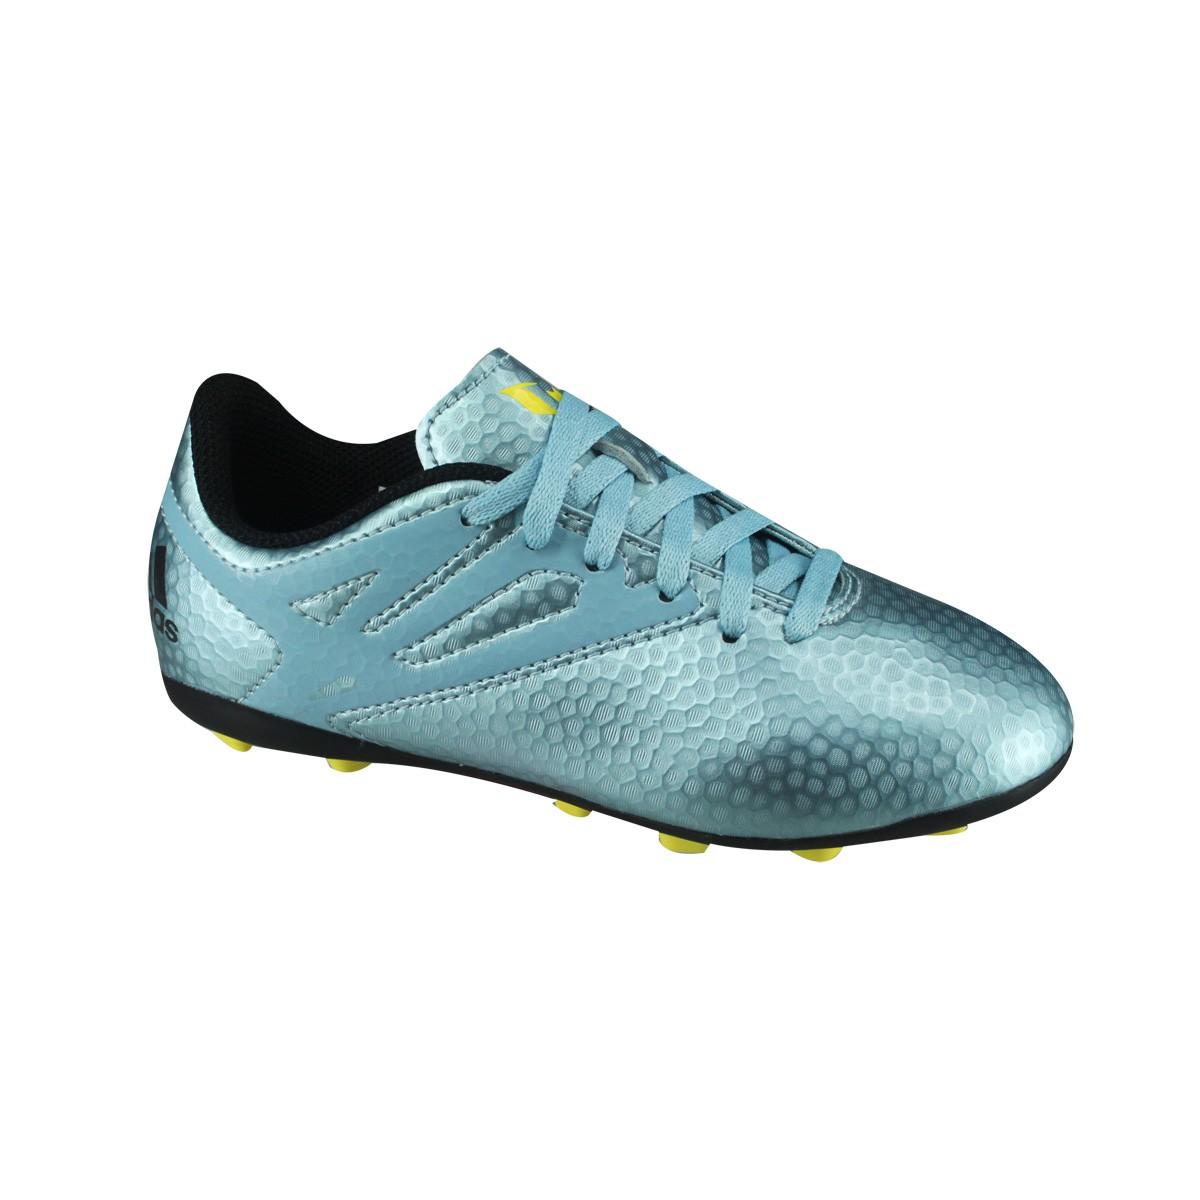 Chuteira Campo Infantil Adidas Messi 15.4 FXG B26956 Petroleo a8c47b12bc741